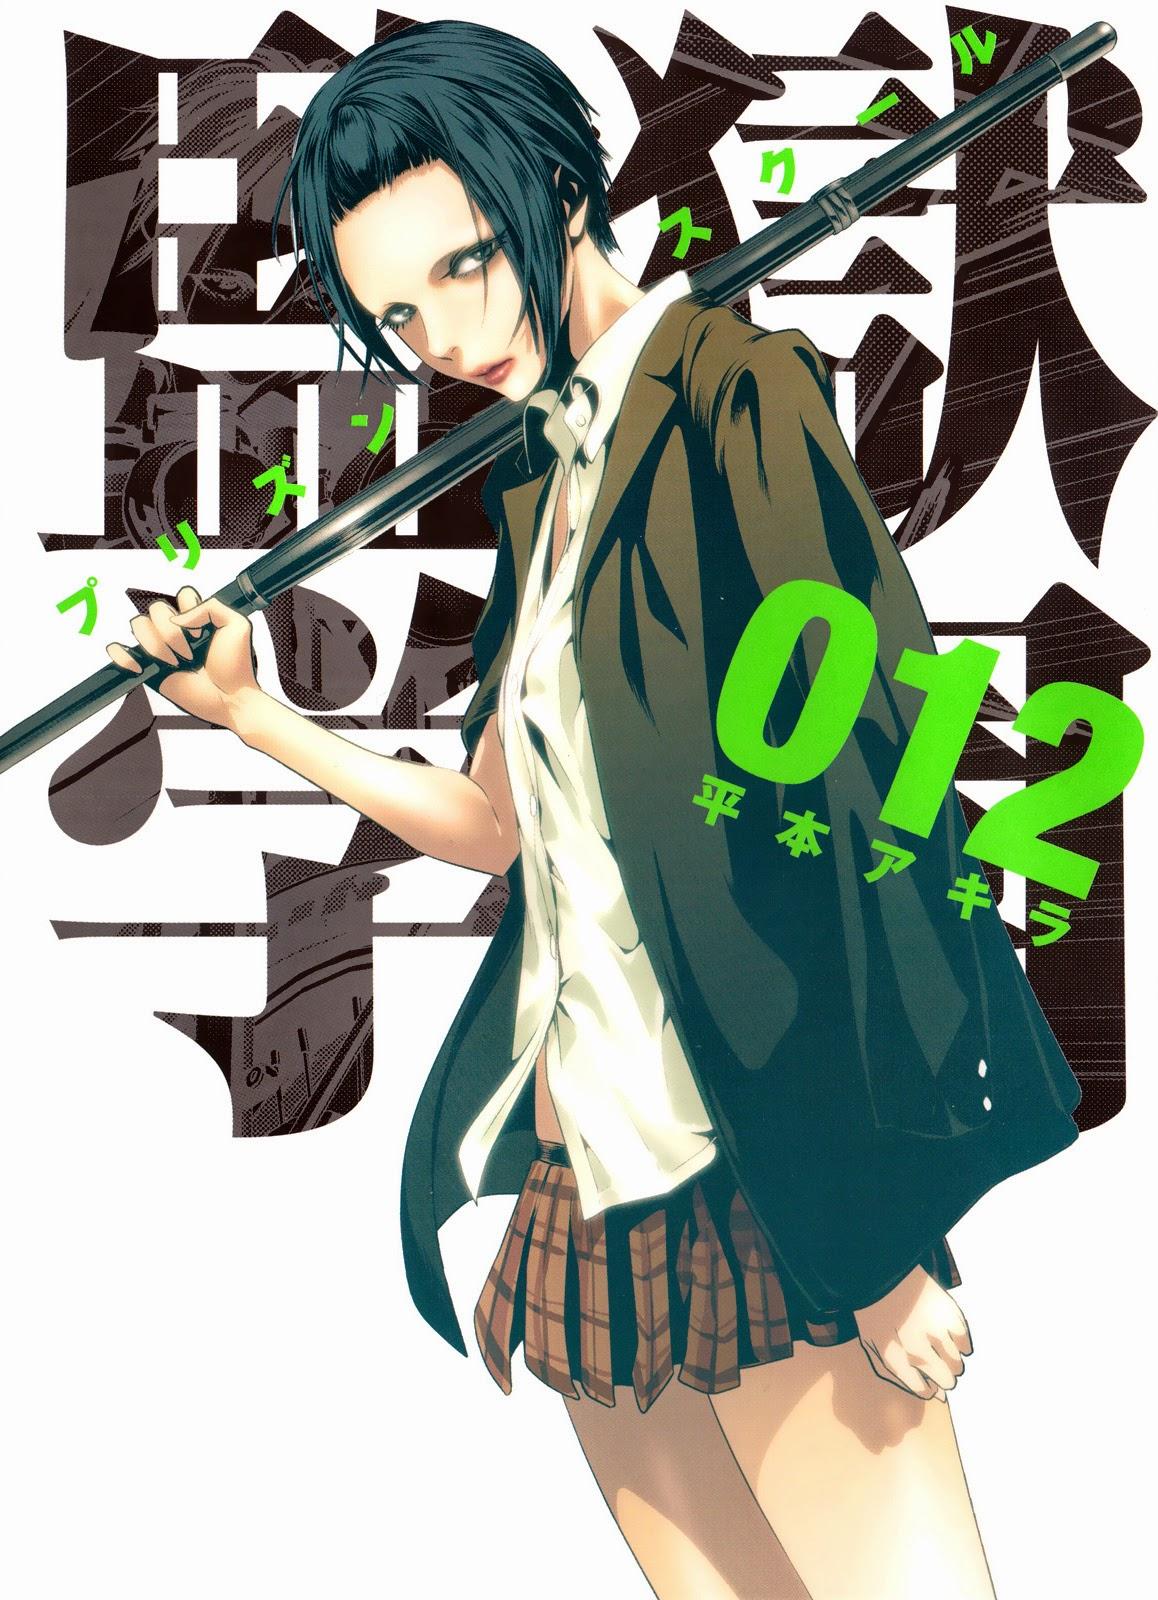 [Hasta el tomo 12]Kangoku Gakuen (Prison School) [MANGA][MEGA][1-14/??] Sin categoría   [Hasta el tomo 12]Kangoku Gakuen (Prison School) [MANGA][MEGA][1-14/??] Sin categoría   [Hasta el tomo 12]Kangoku Gakuen (Prison School) [MANGA][MEGA][1-14/??] Sin categoría   [Hasta el tomo 12]Kangoku Gakuen (Prison School) [MANGA][MEGA][1-14/??] Sin categoría